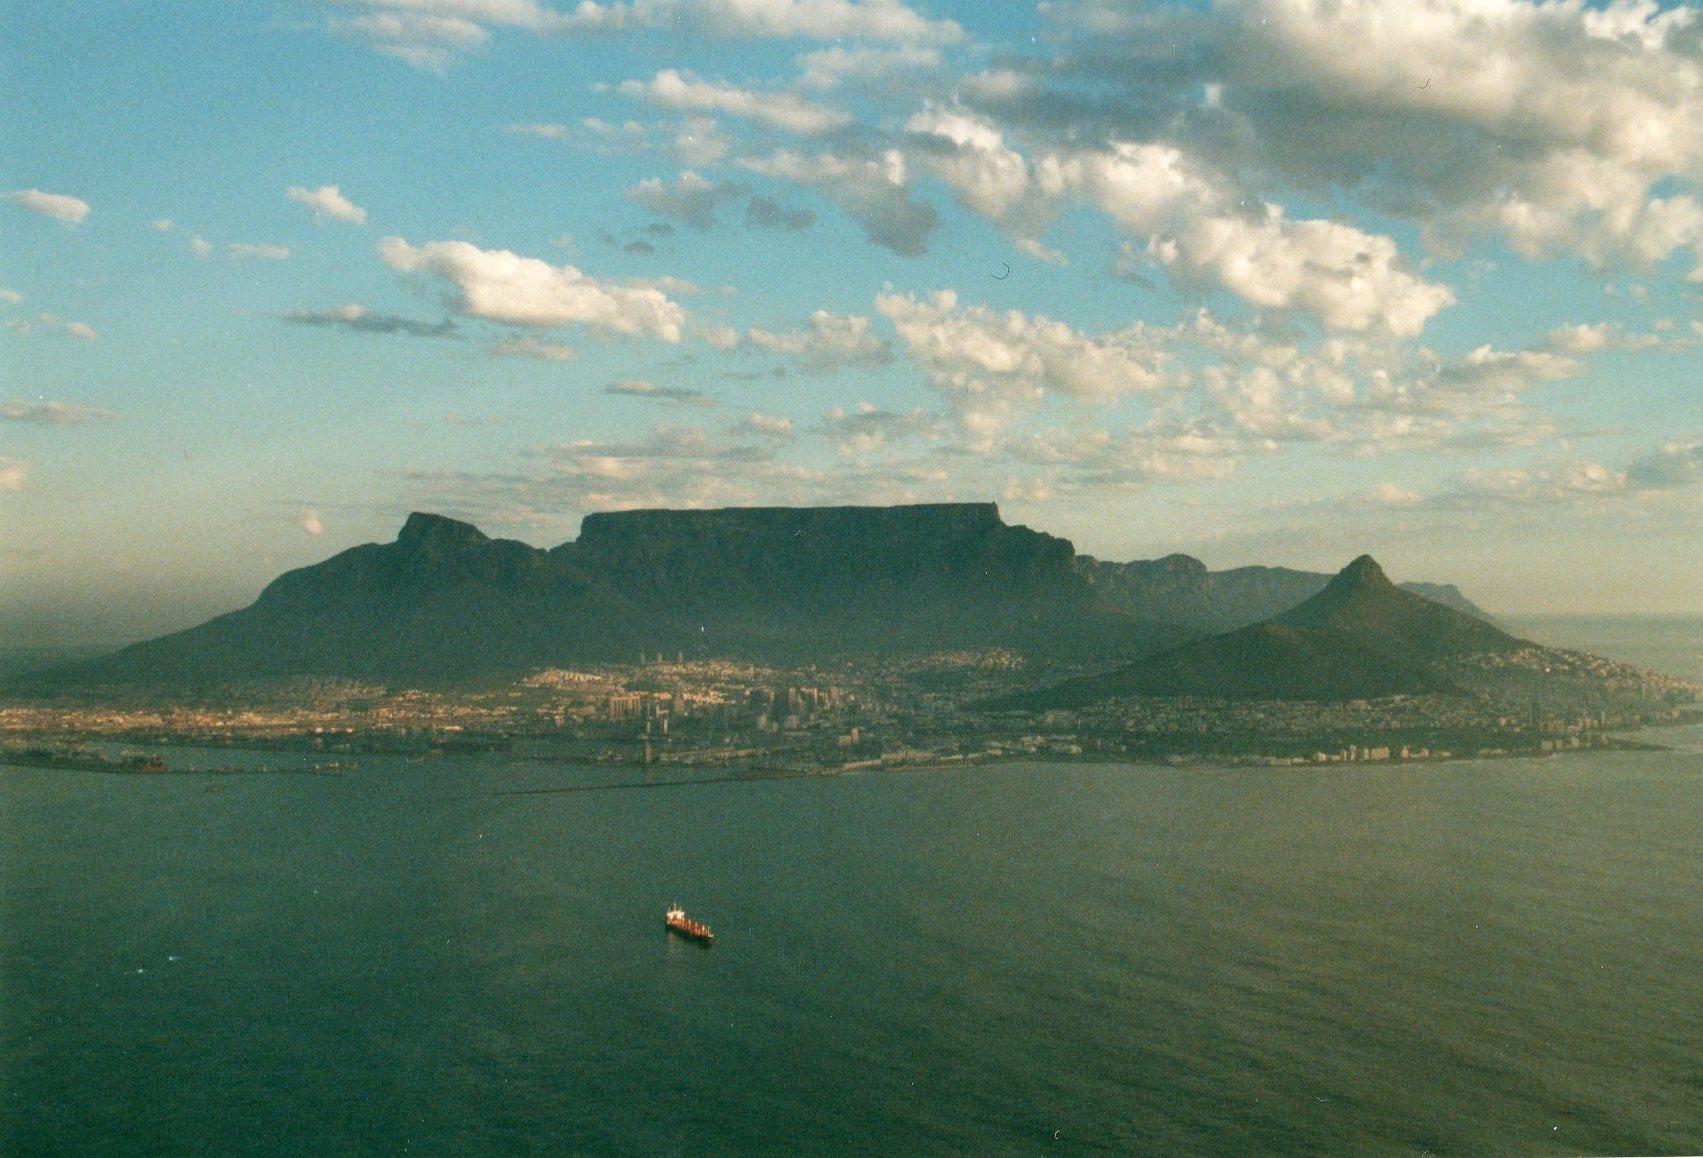 South Africa Western Cape Cape Area, Cape of Good Hope, Table Mountain, top end of Cape peninsula, Walkopedia